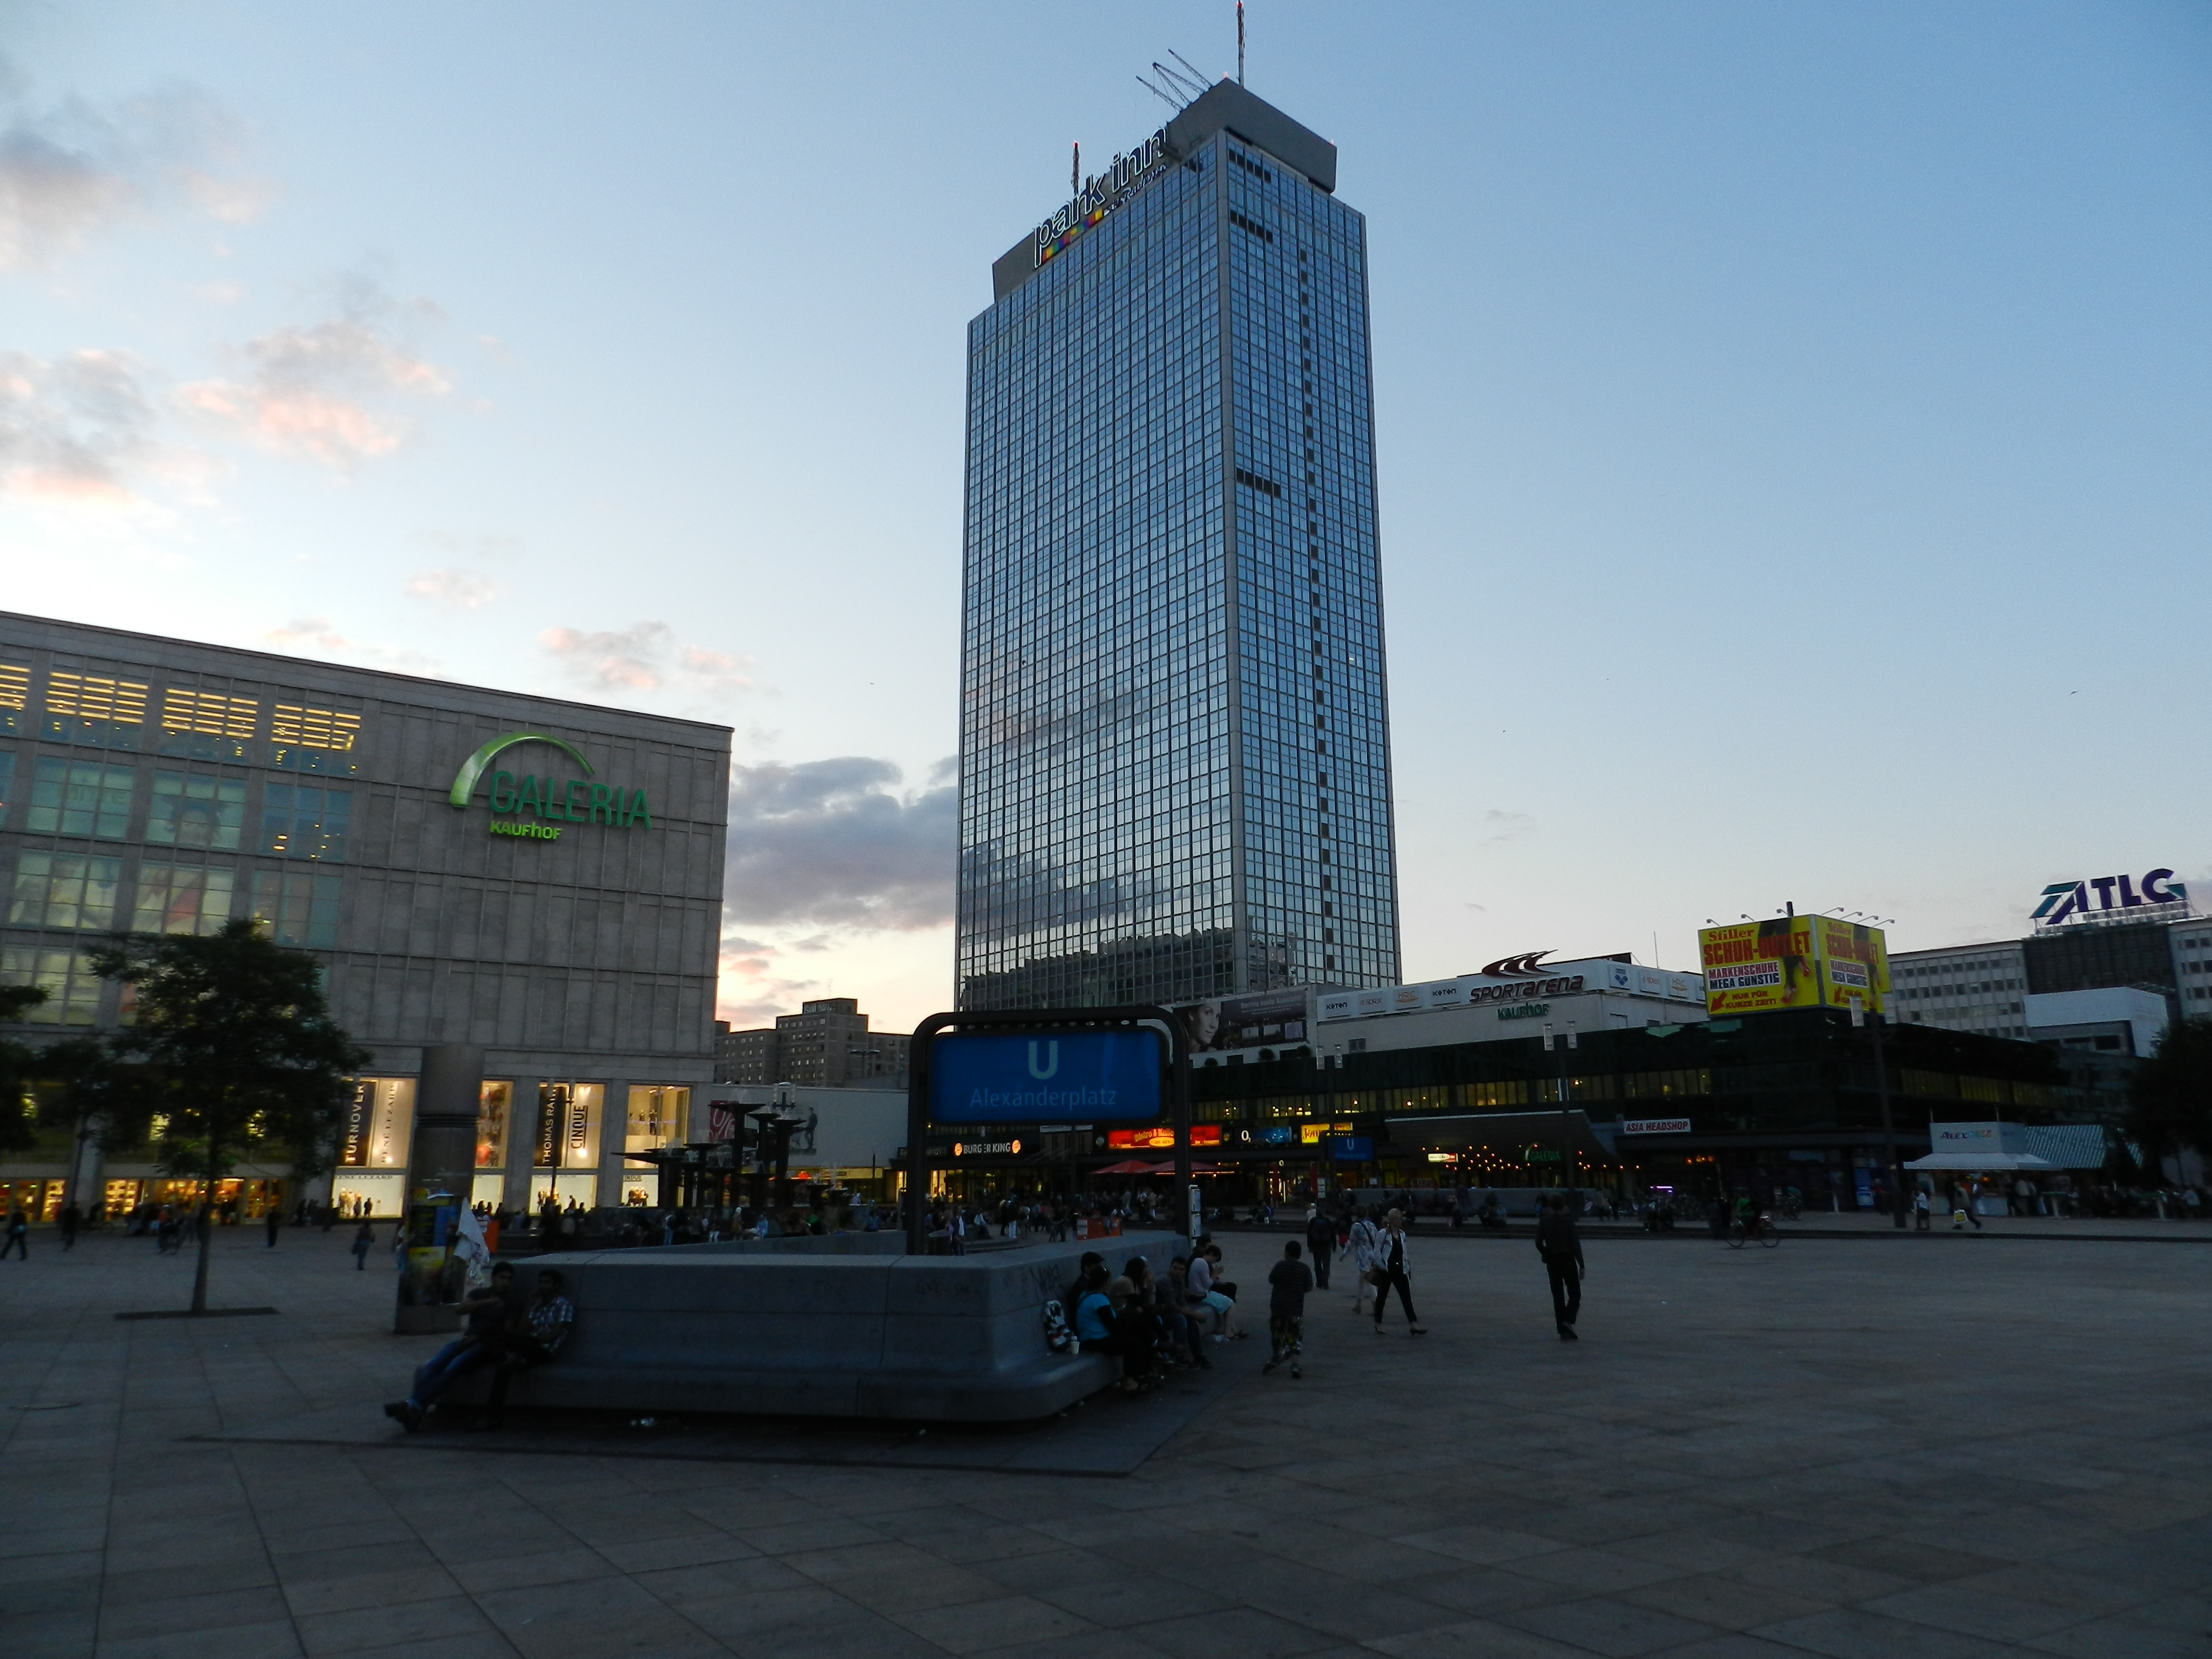 Alexanderplatz i skymningen